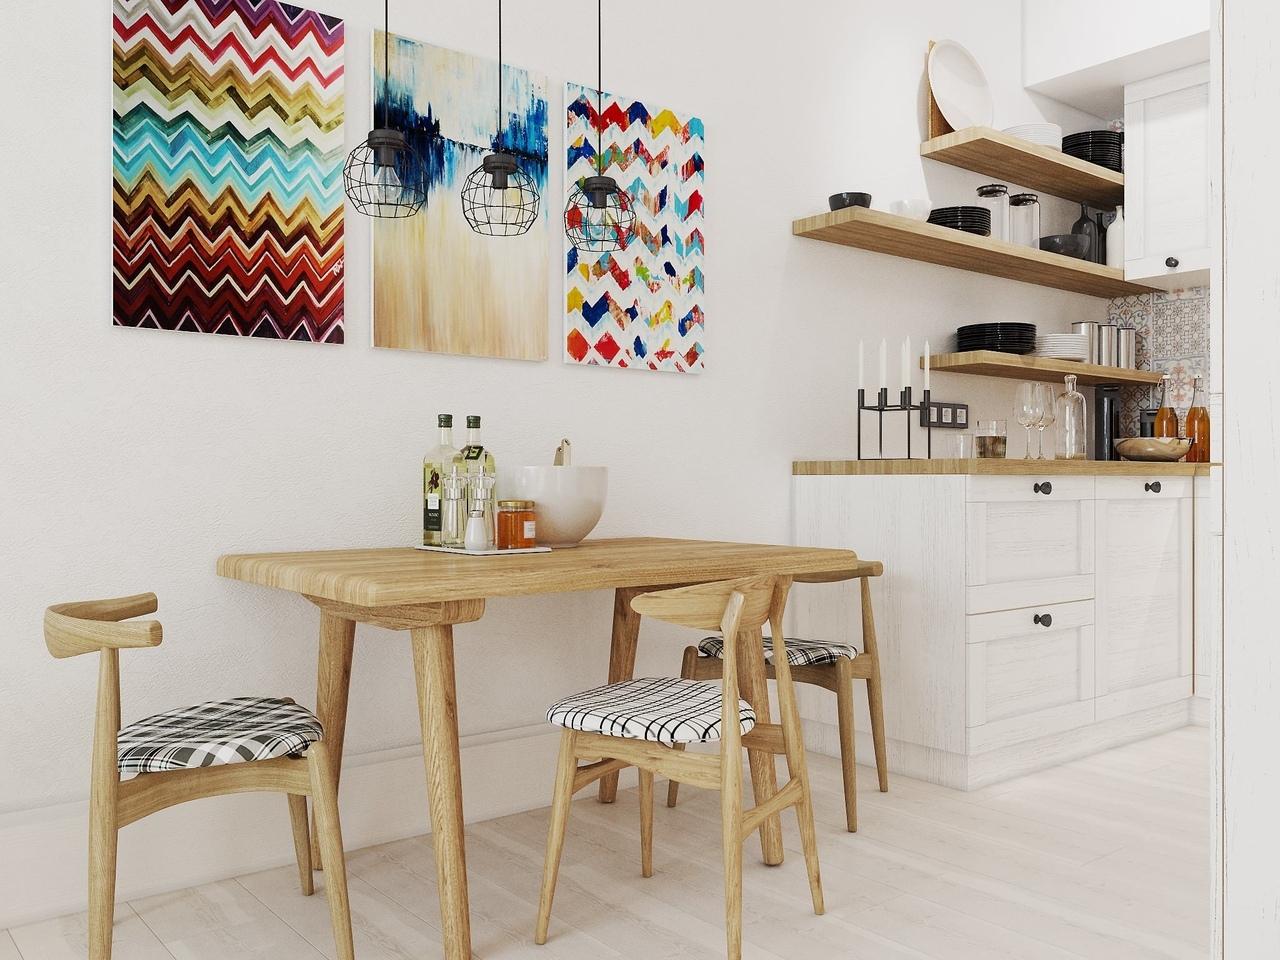 Проект скандинавской квартиры на 30 кв.